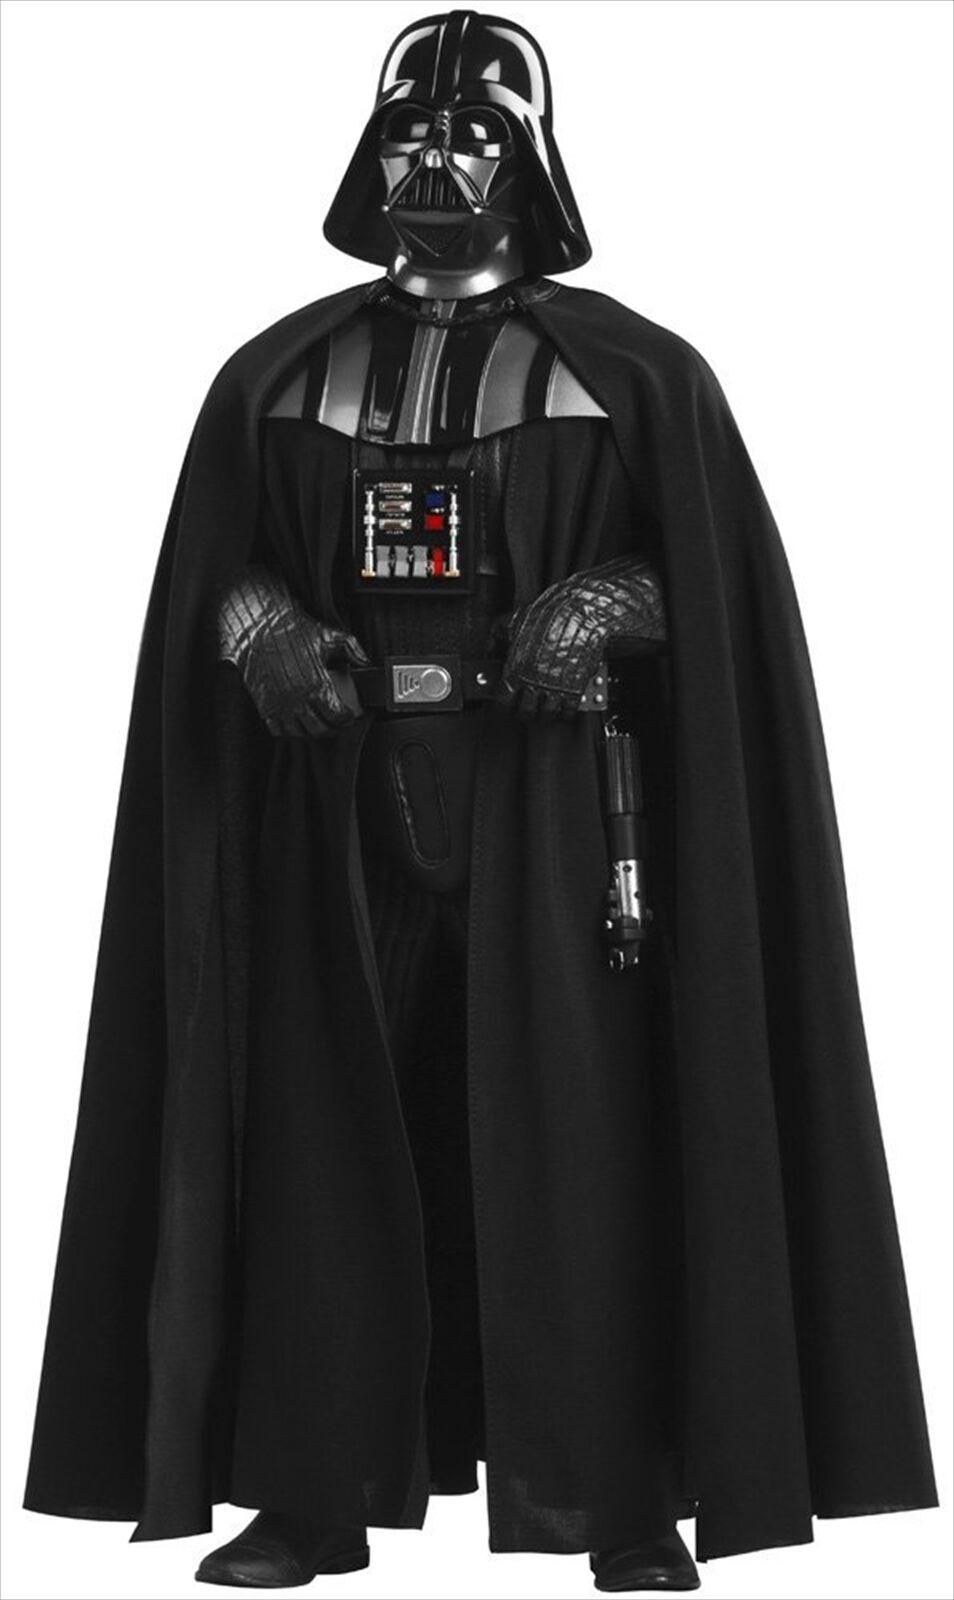 Sideshow Star Wars Lord of Sith Darth Darth Darth Vader Return of the Jedi 1/6 Action Figure 2c8f3b